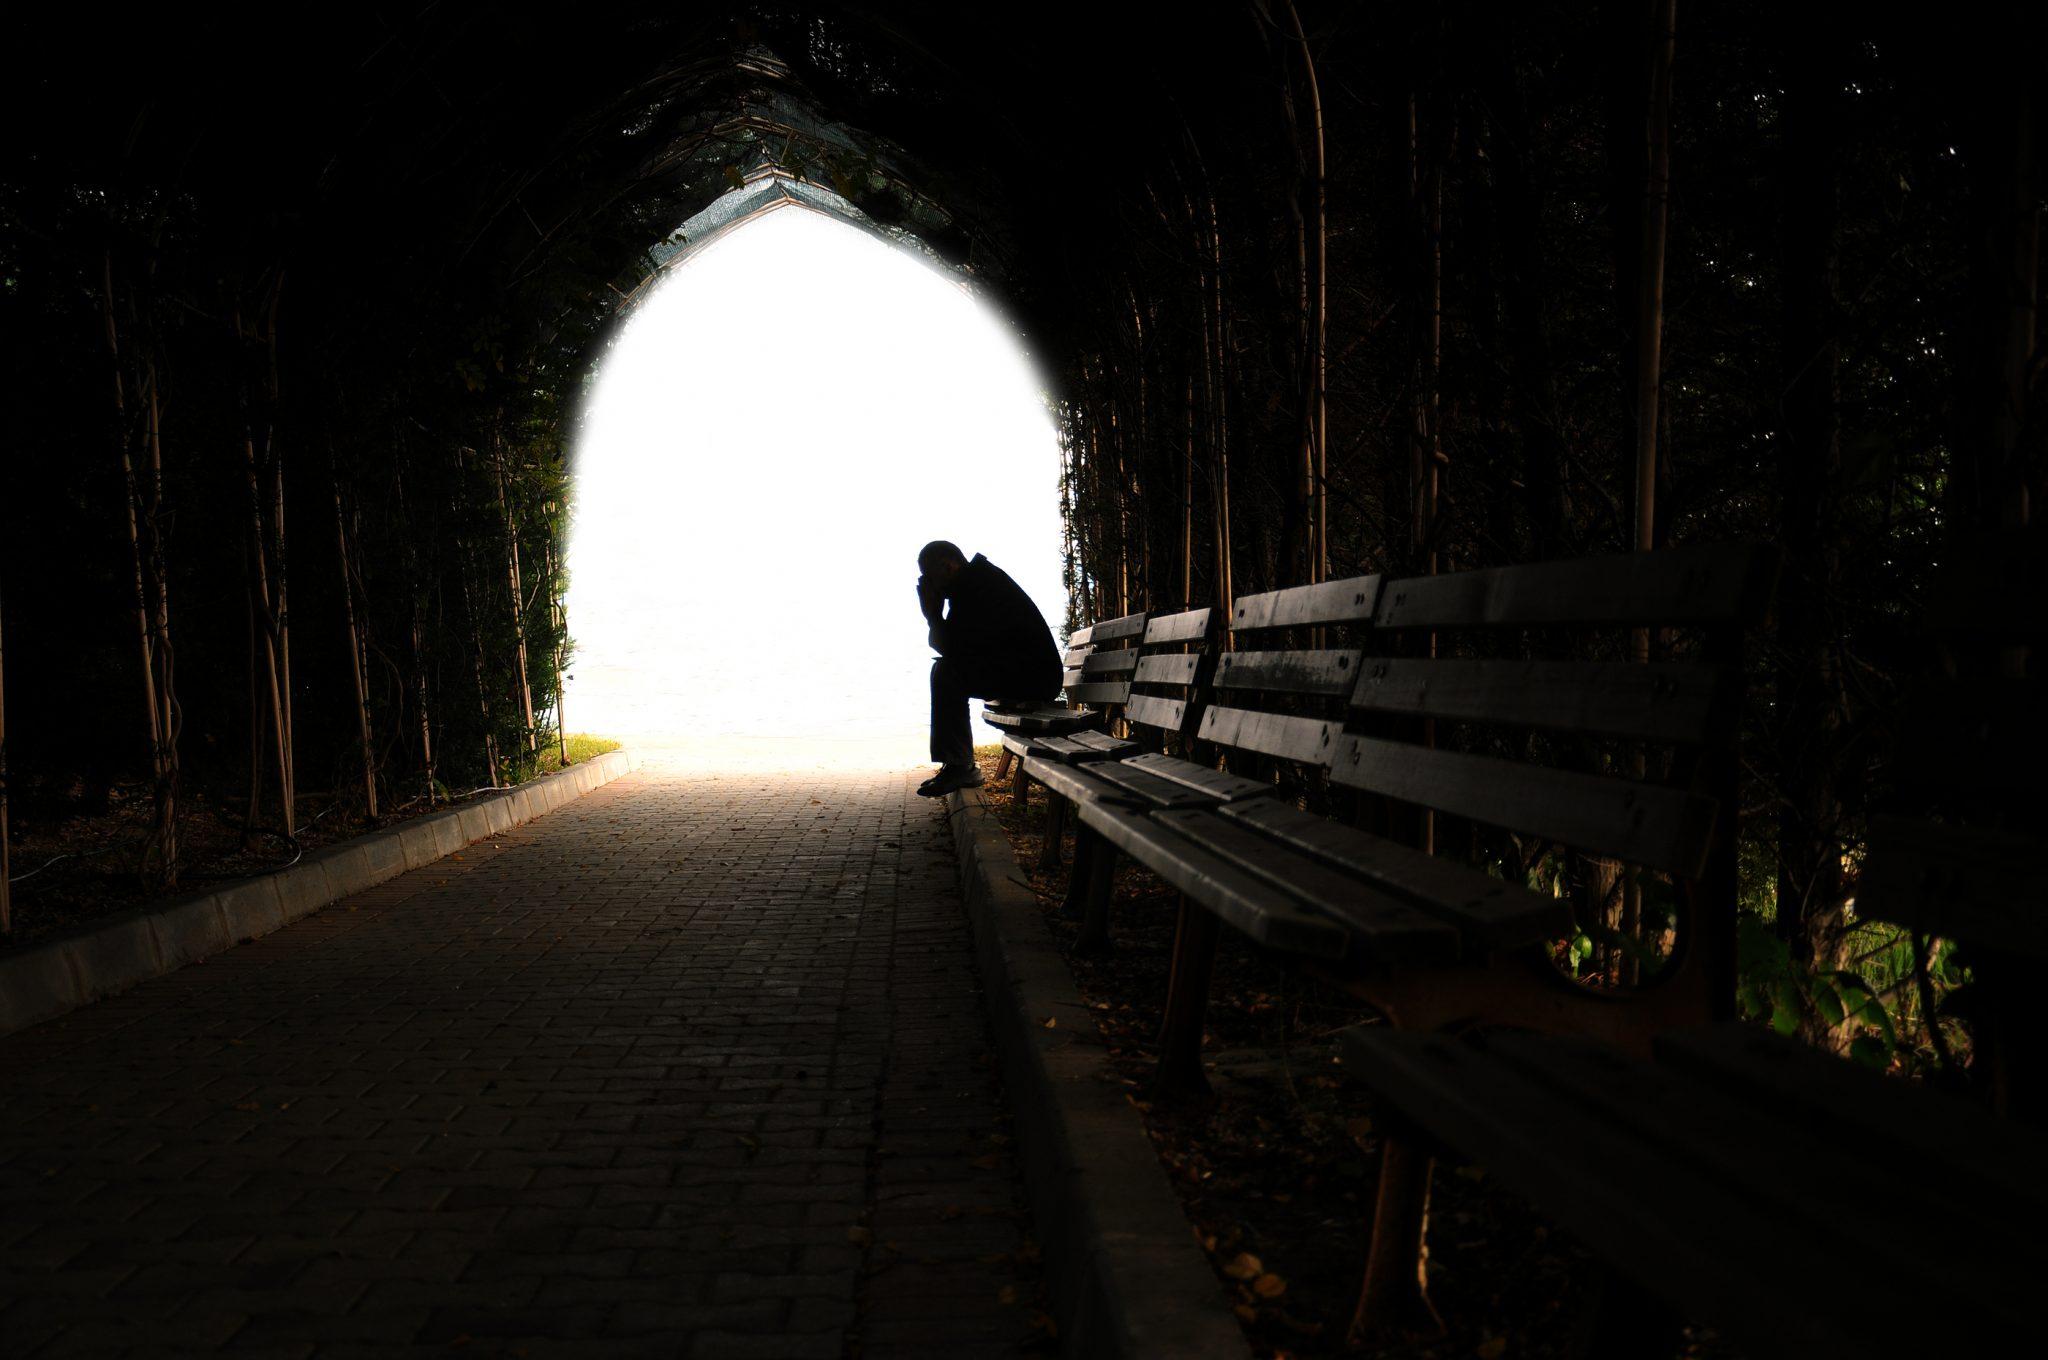 relationship depressed person